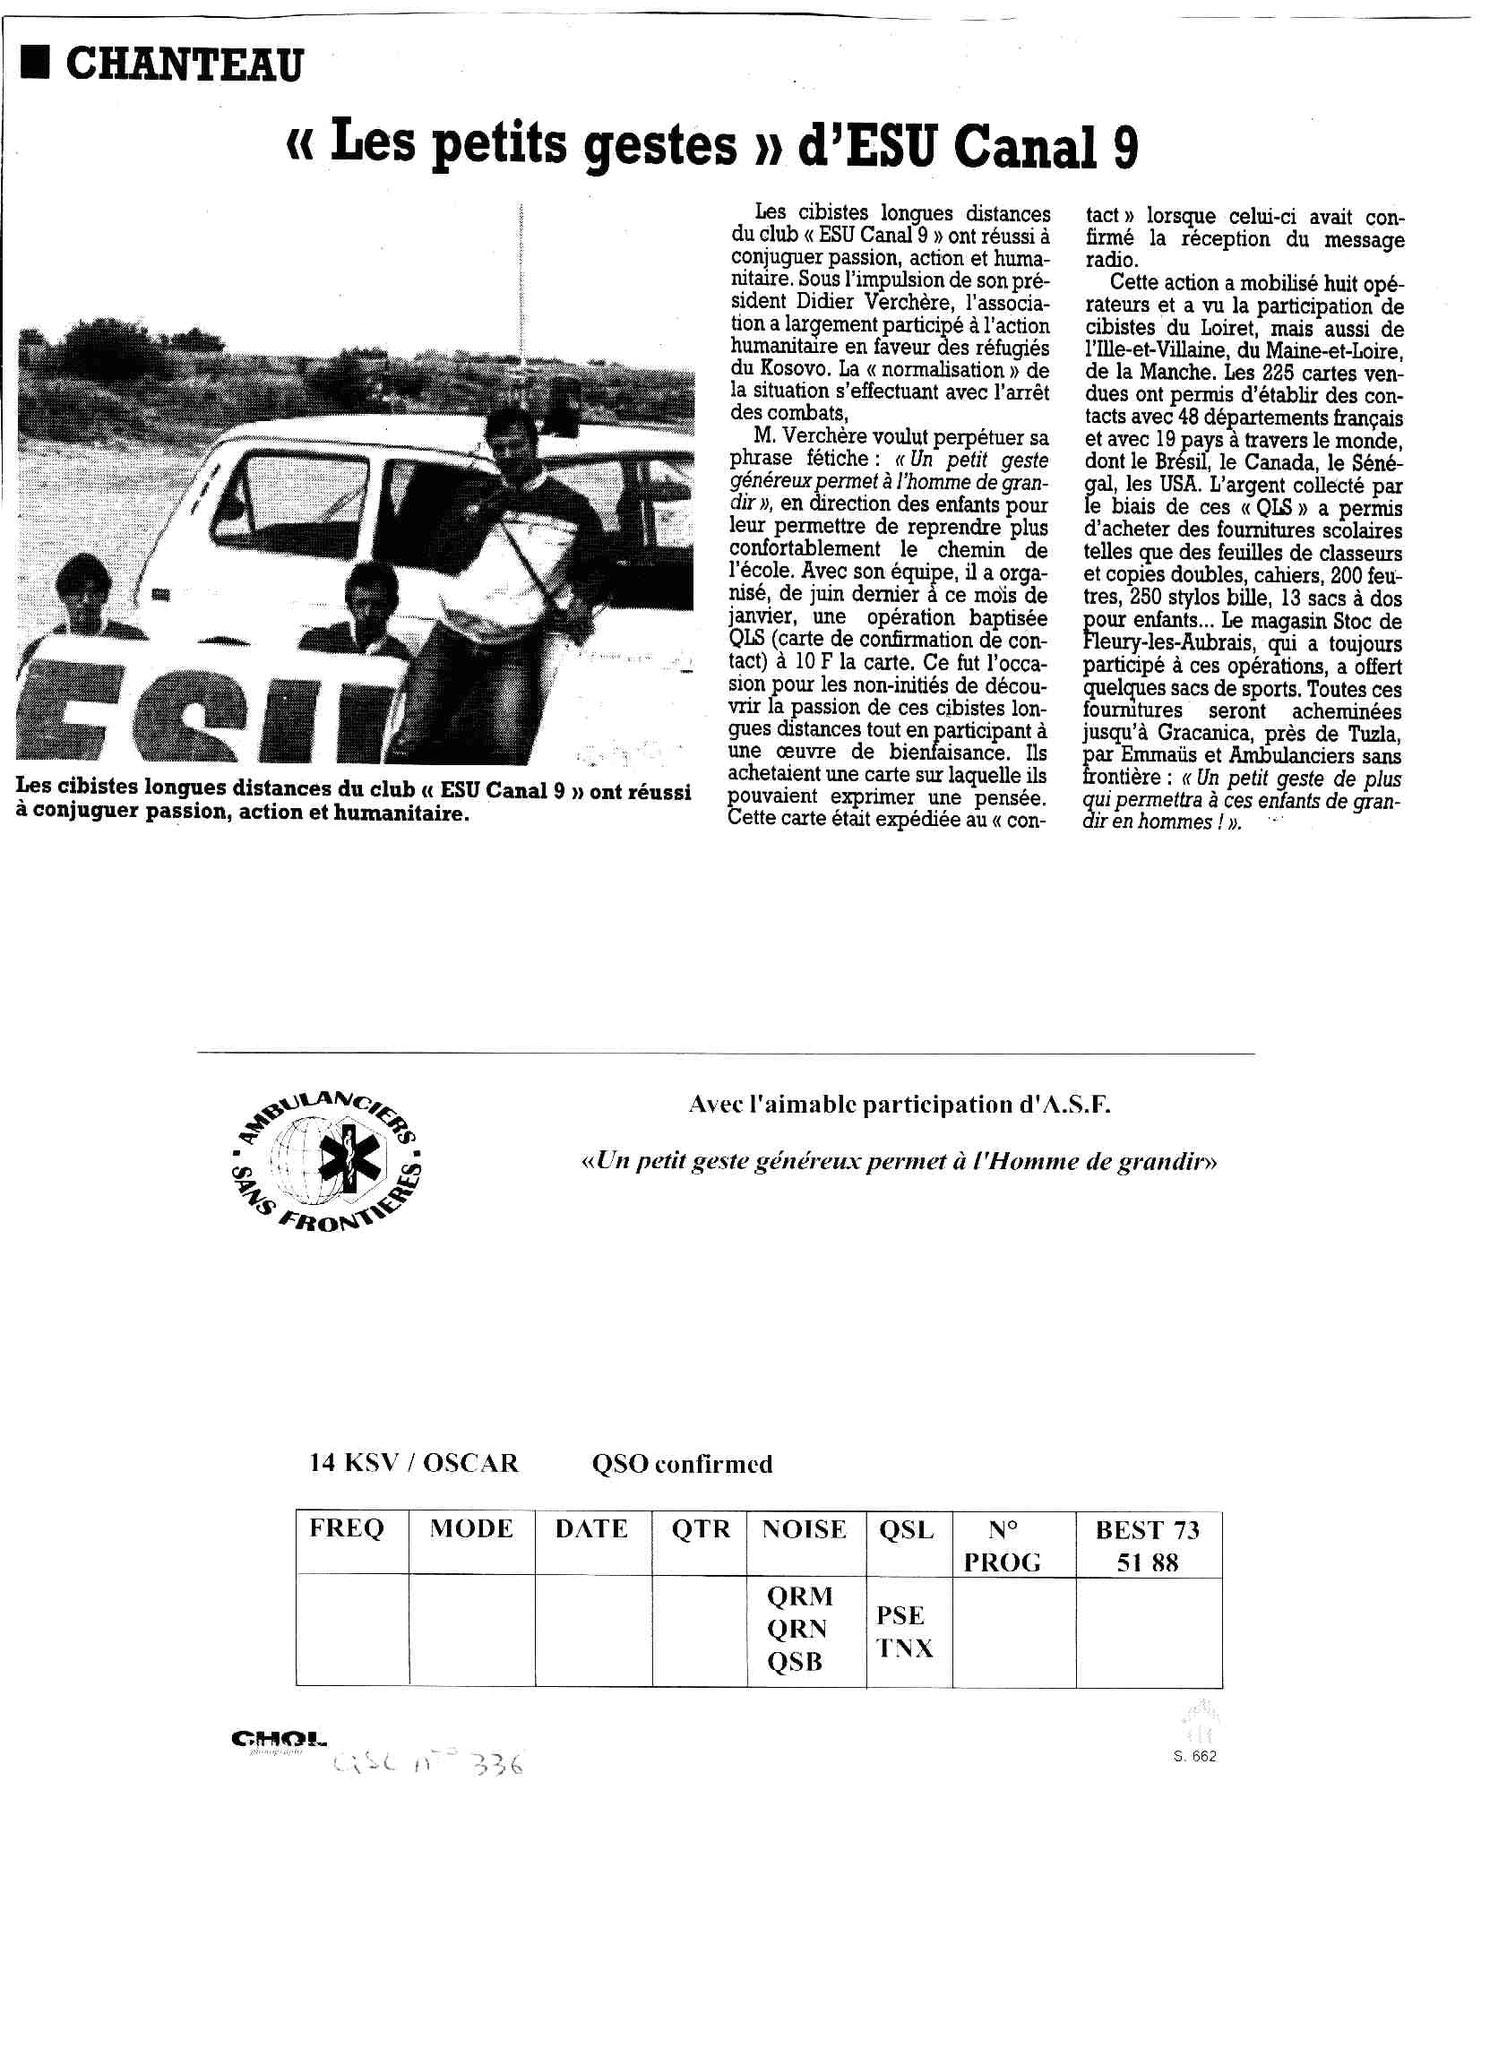 ARTICLE DANS LA PRESSE DX KOSOVO